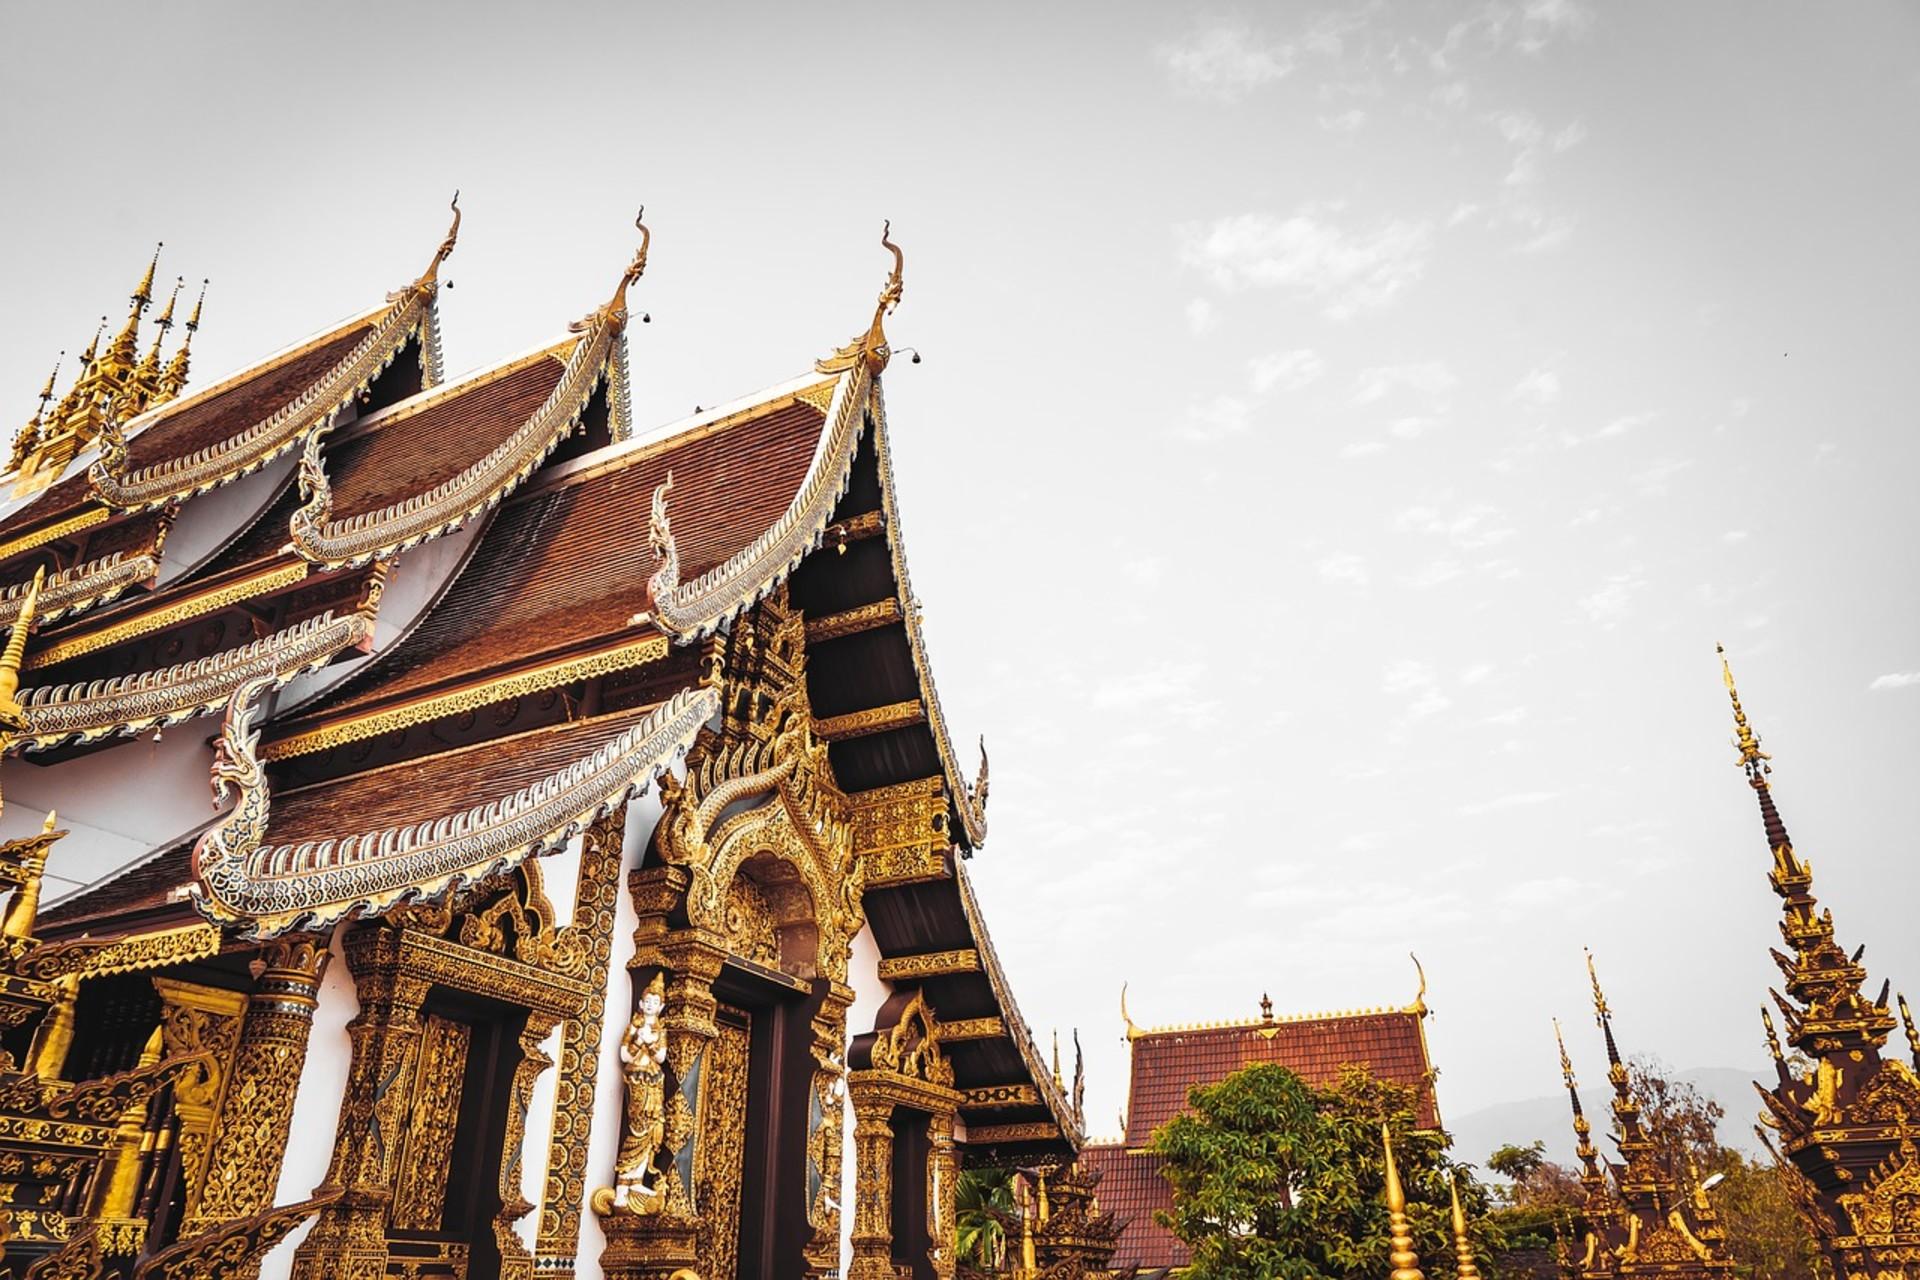 temple-4128662_1280.jpg